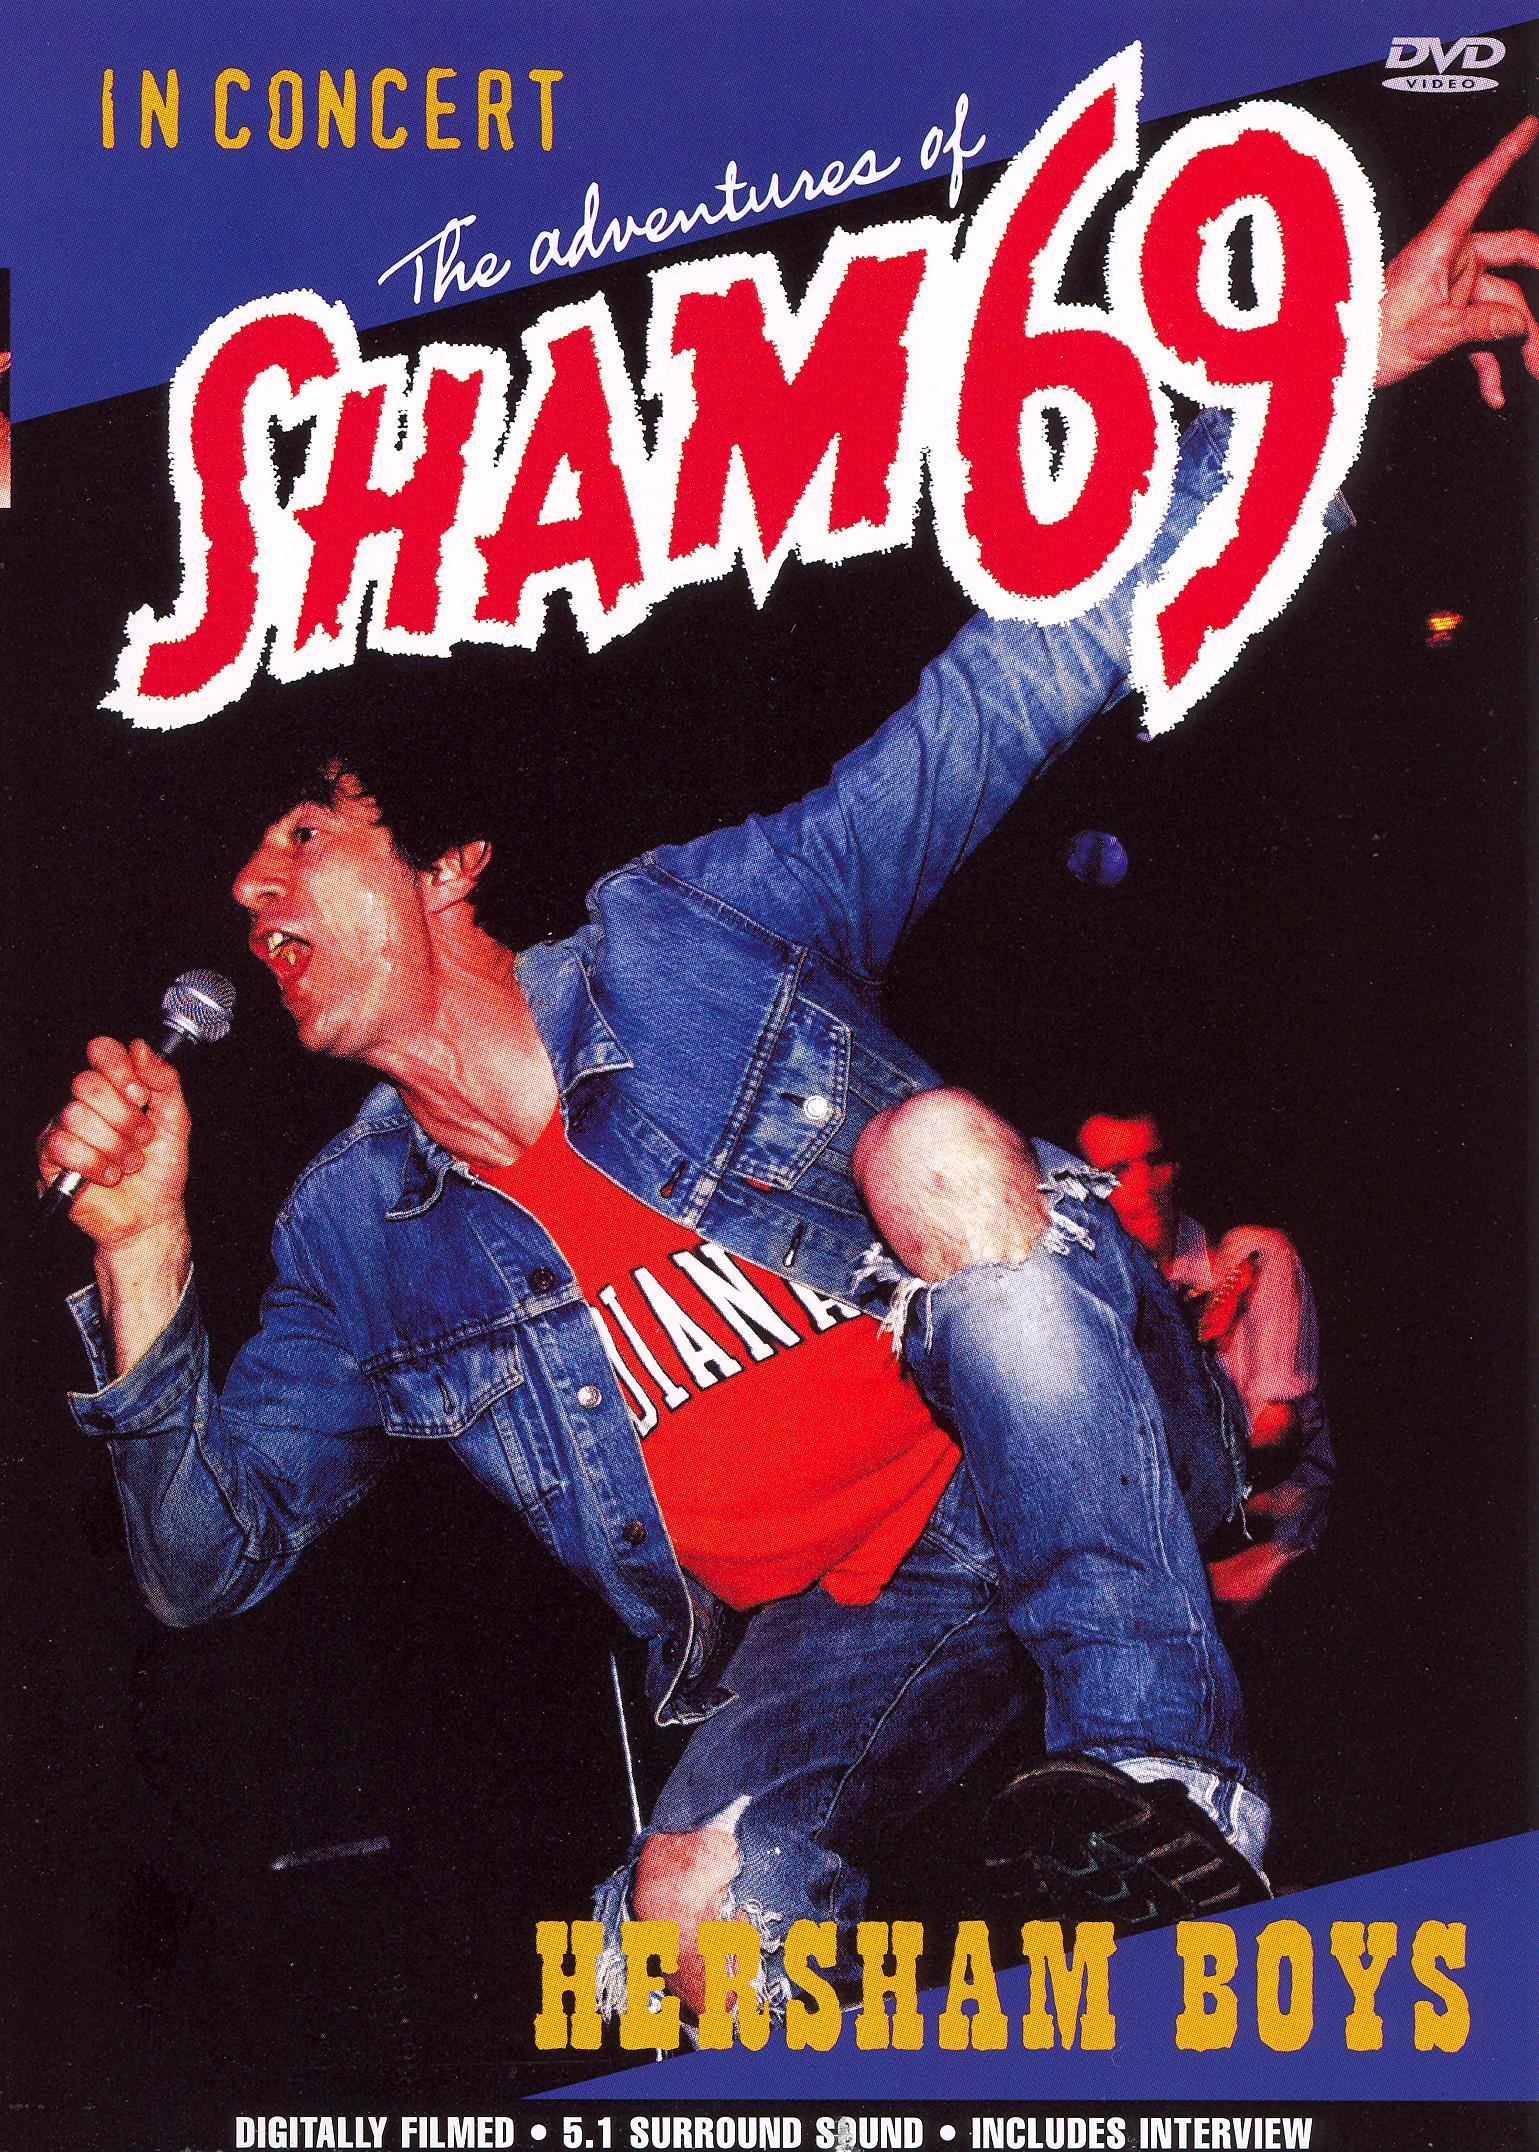 Sham 69: In Concert - The Adventures of Sham 69